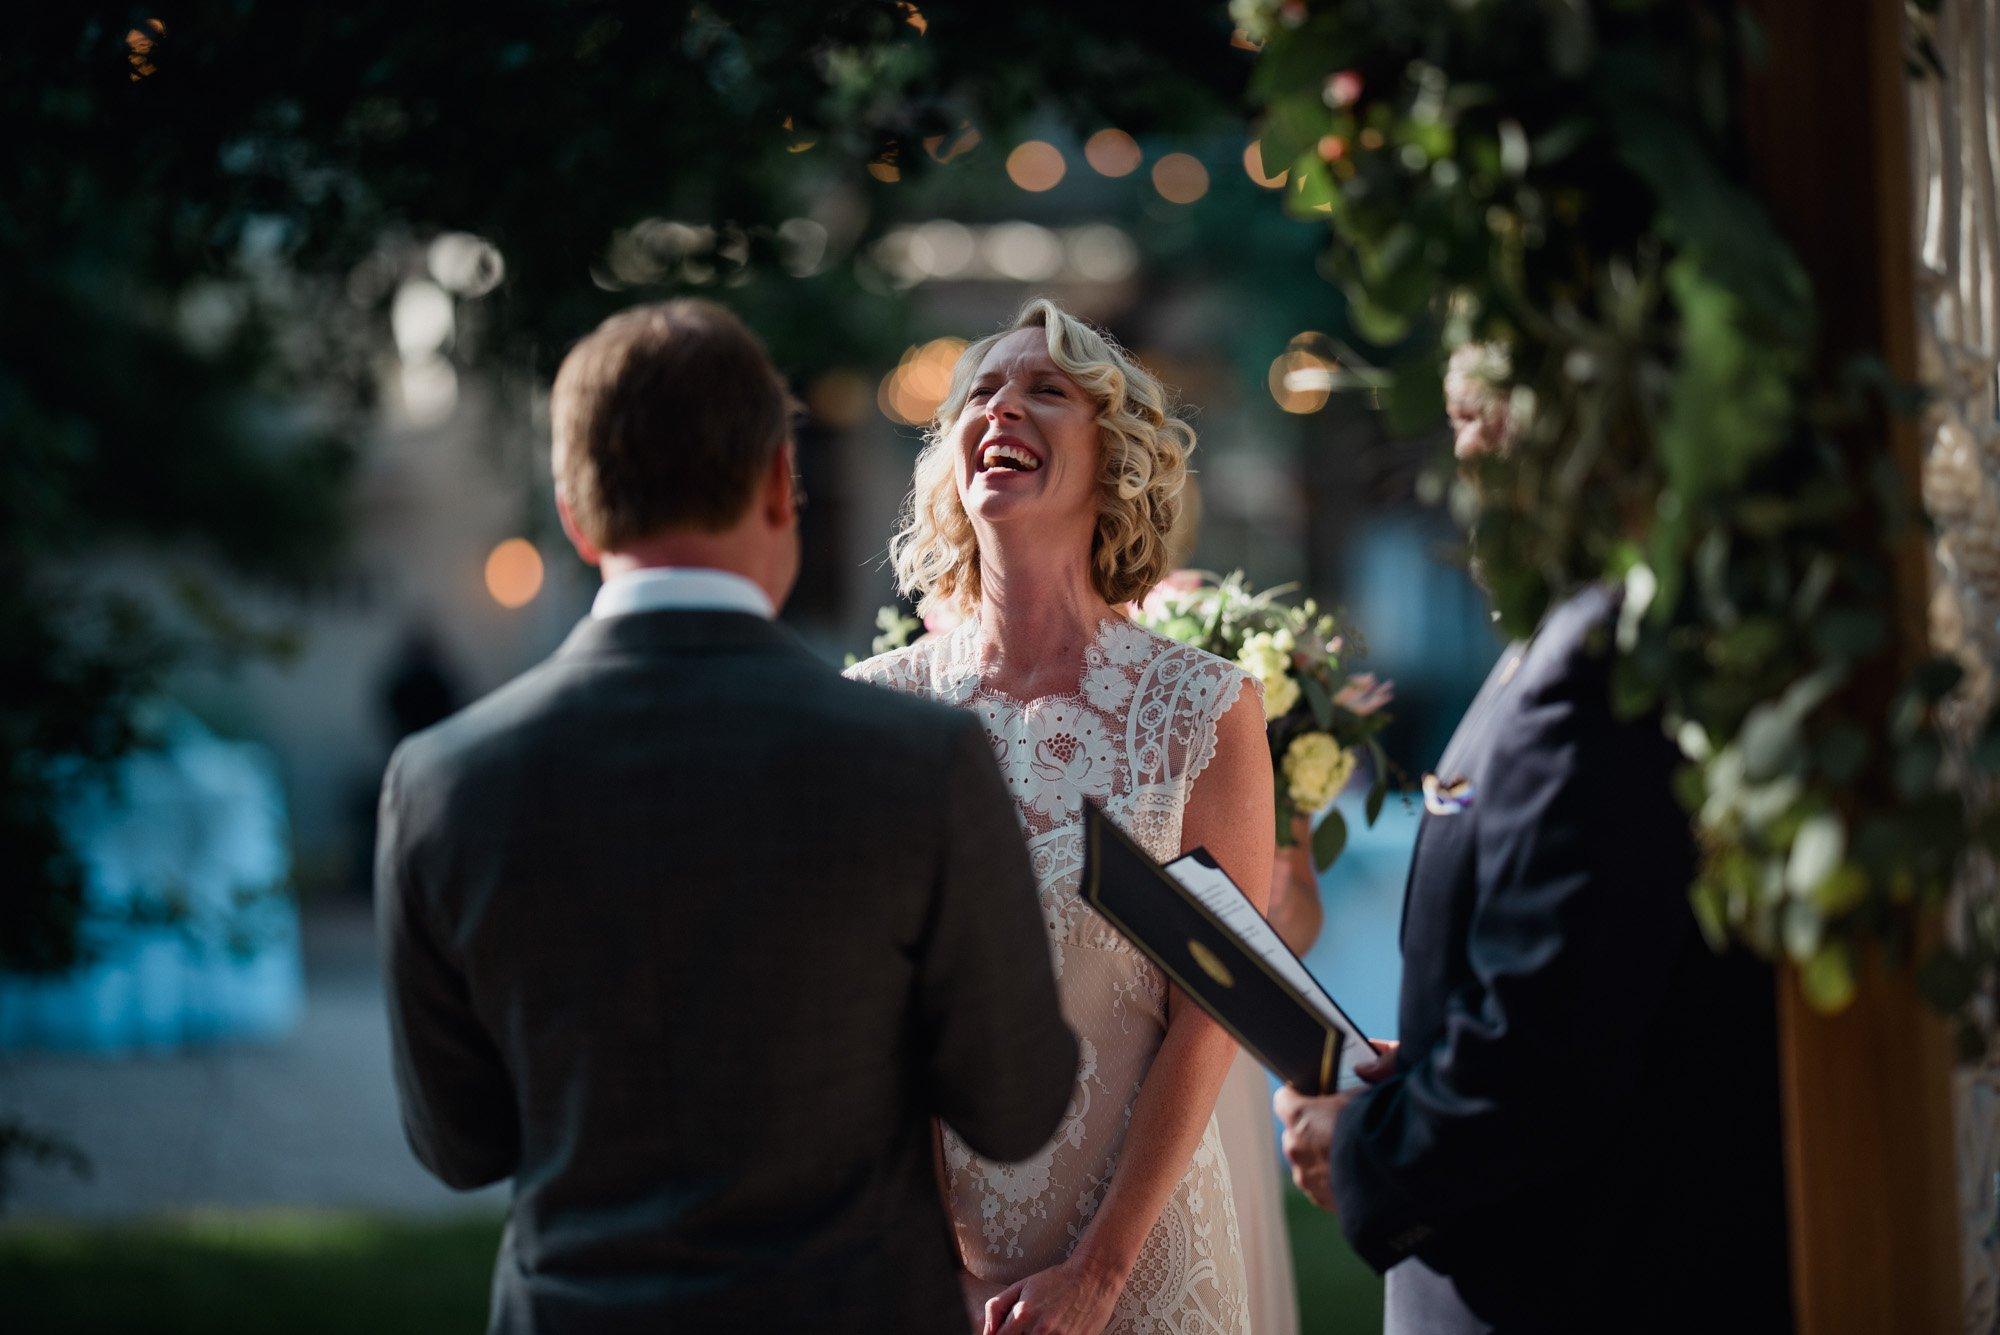 Mercury hall wedding ceremony photographs outdoors